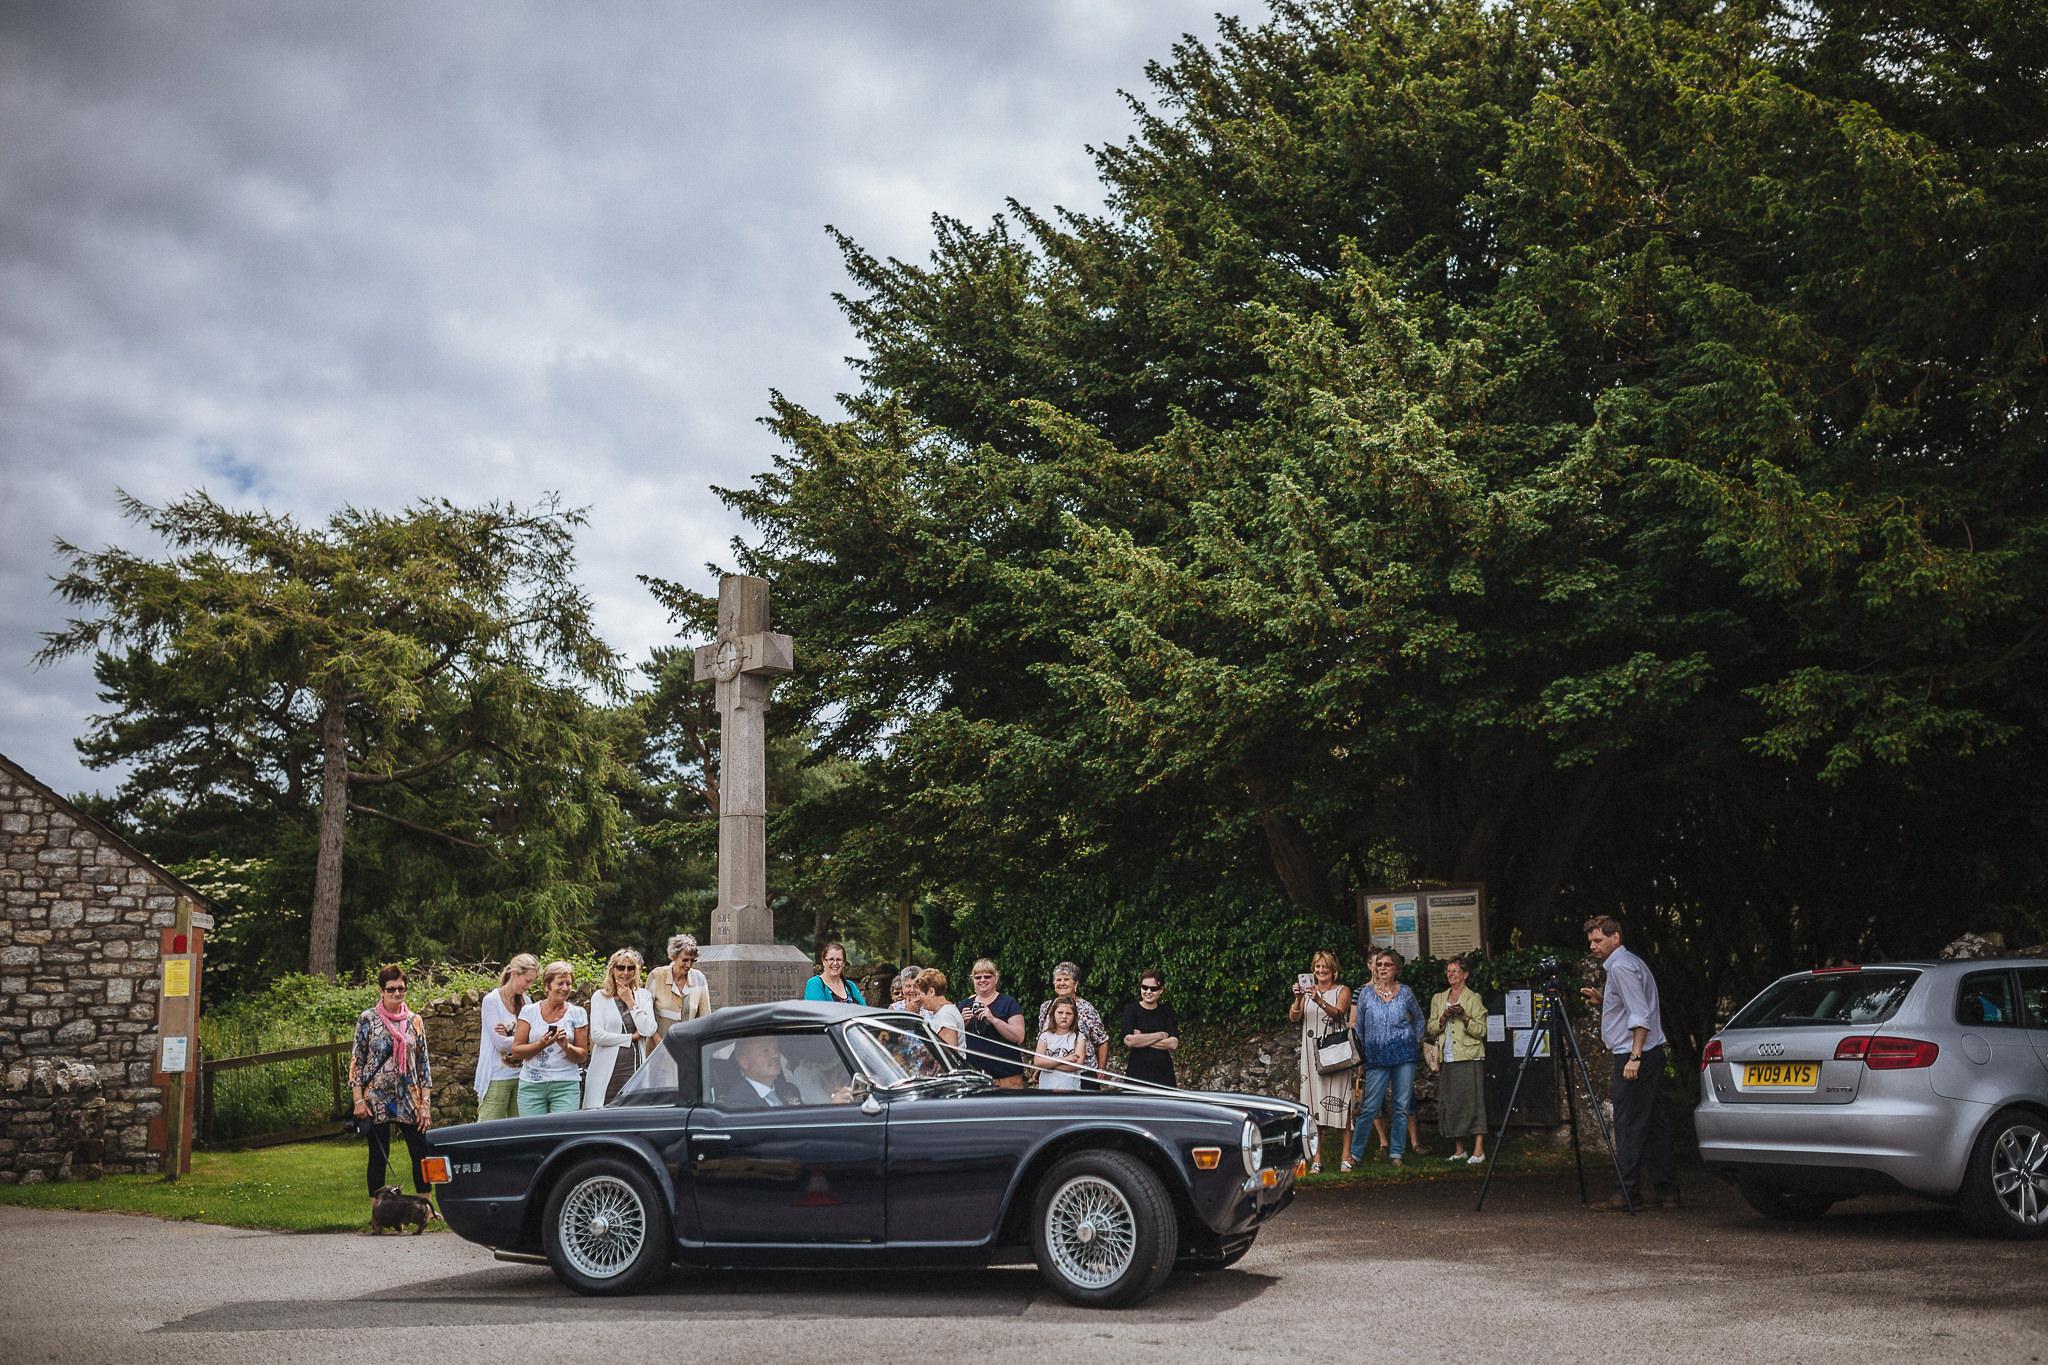 paul-marbrook-Farm-Wedding-Photographer-Lancashire-90022